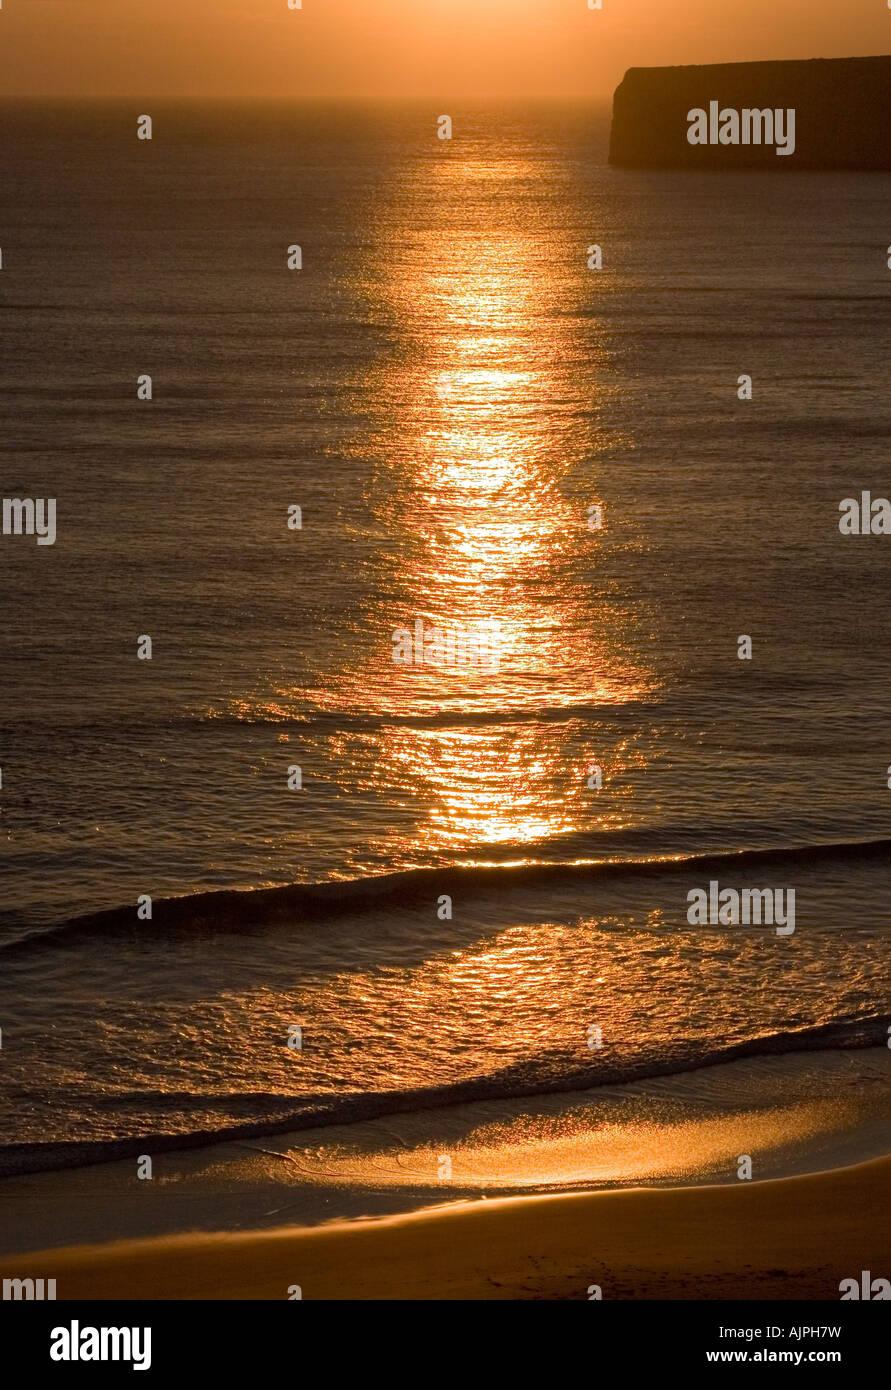 Setting sun glinting off waves lapping onto the shoreline between Cabo de Sao Vincente and Ponta de Sagres Algarve - Stock Image